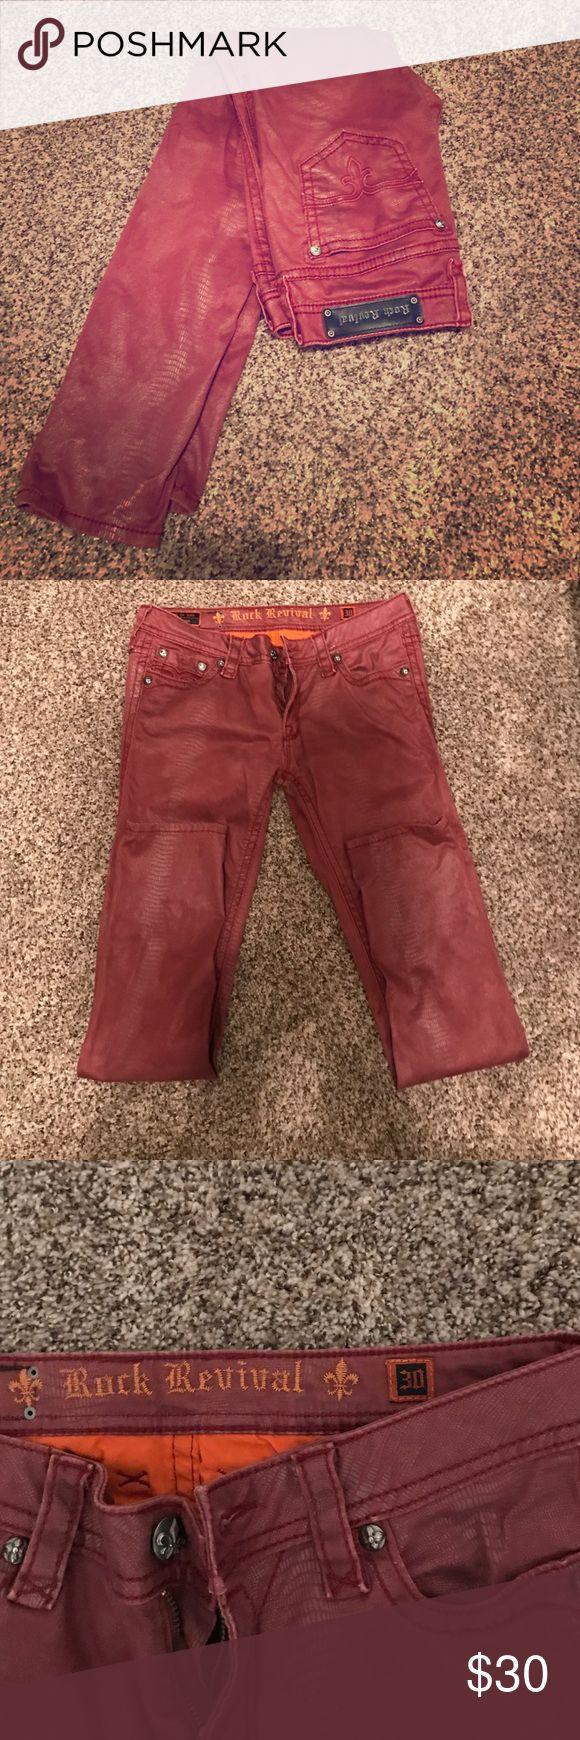 Maroon Python Rock Revival Skinny Jeans Maroon python print Rock Revival Skinny Jeans. Size 30. Ankle length. Rhinestones on pockets. Very cute! Rock Revival Jeans Skinny